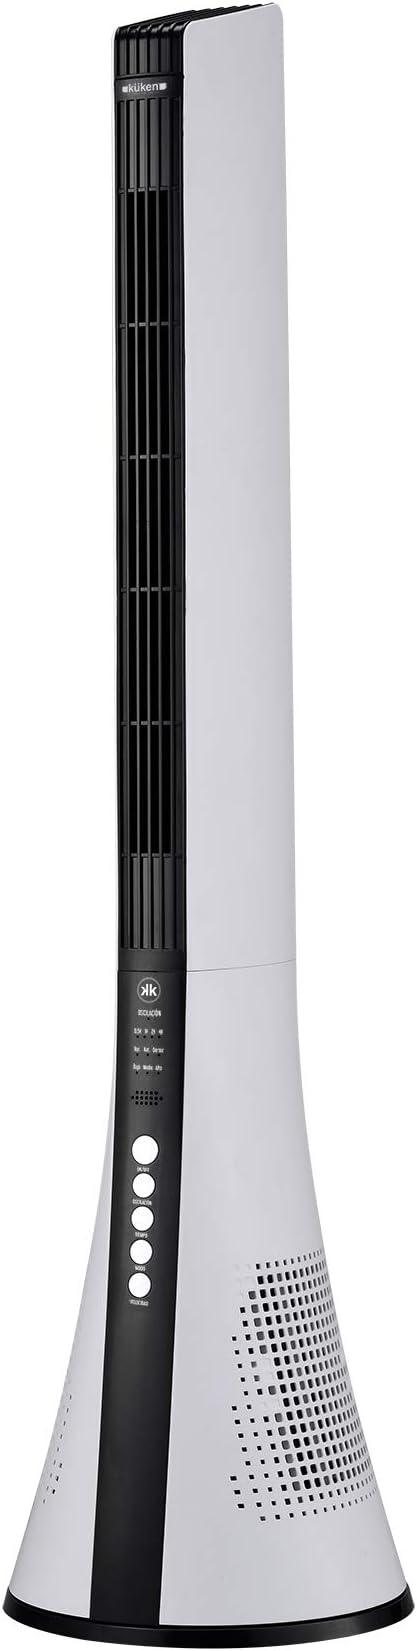 Alfa Kuken Ventilador de Columna Smart 40W 3 Velocidades 3 Modos ...